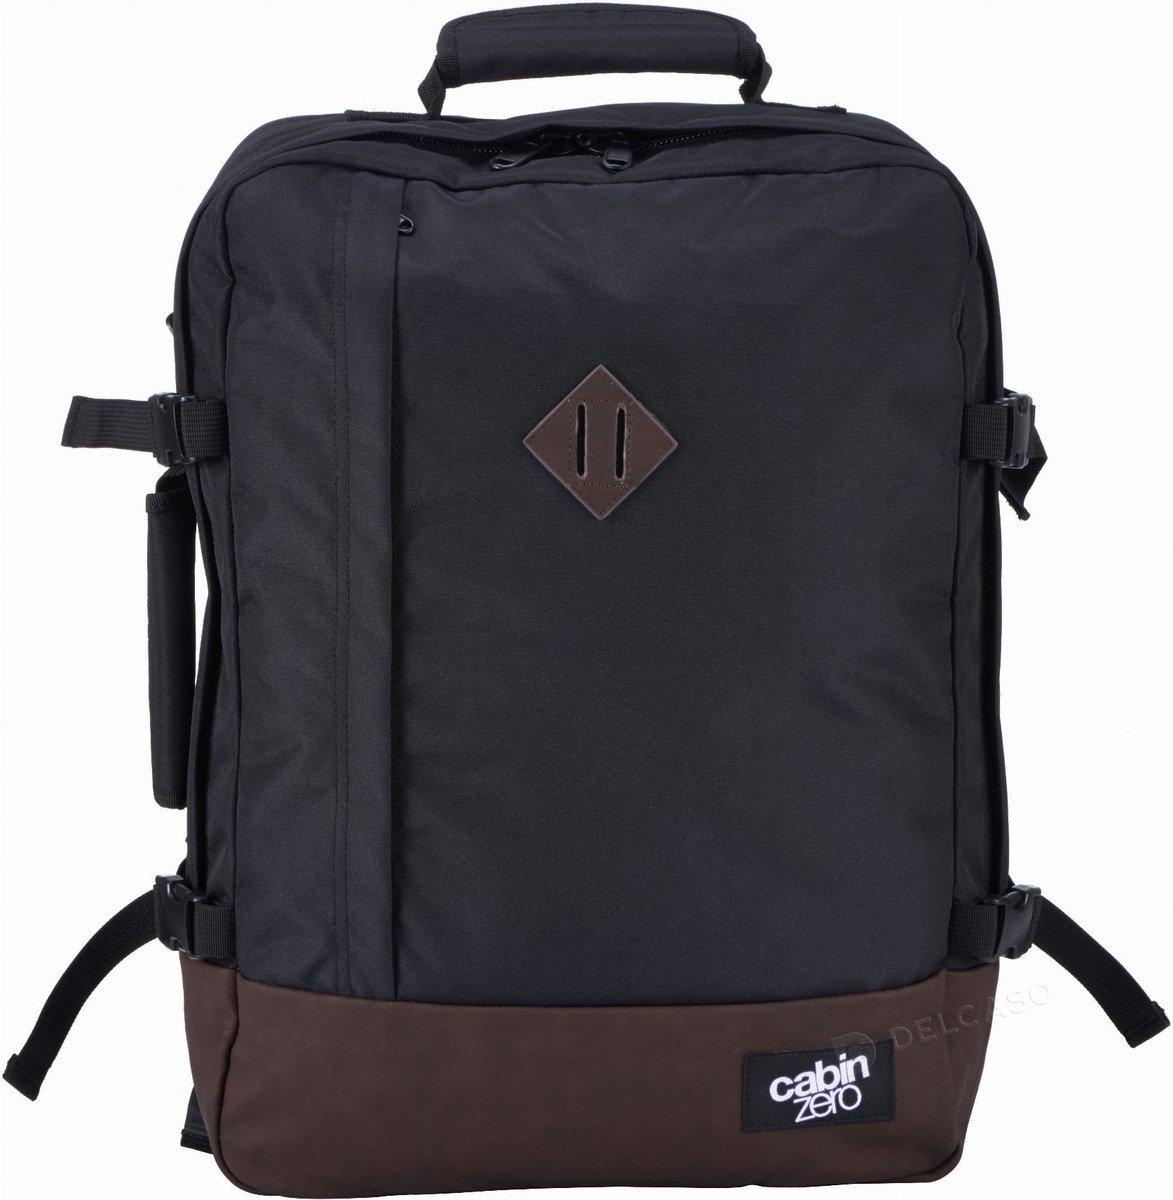 Plecak torba podręczna Cabin Zero Vintage 44L czarna